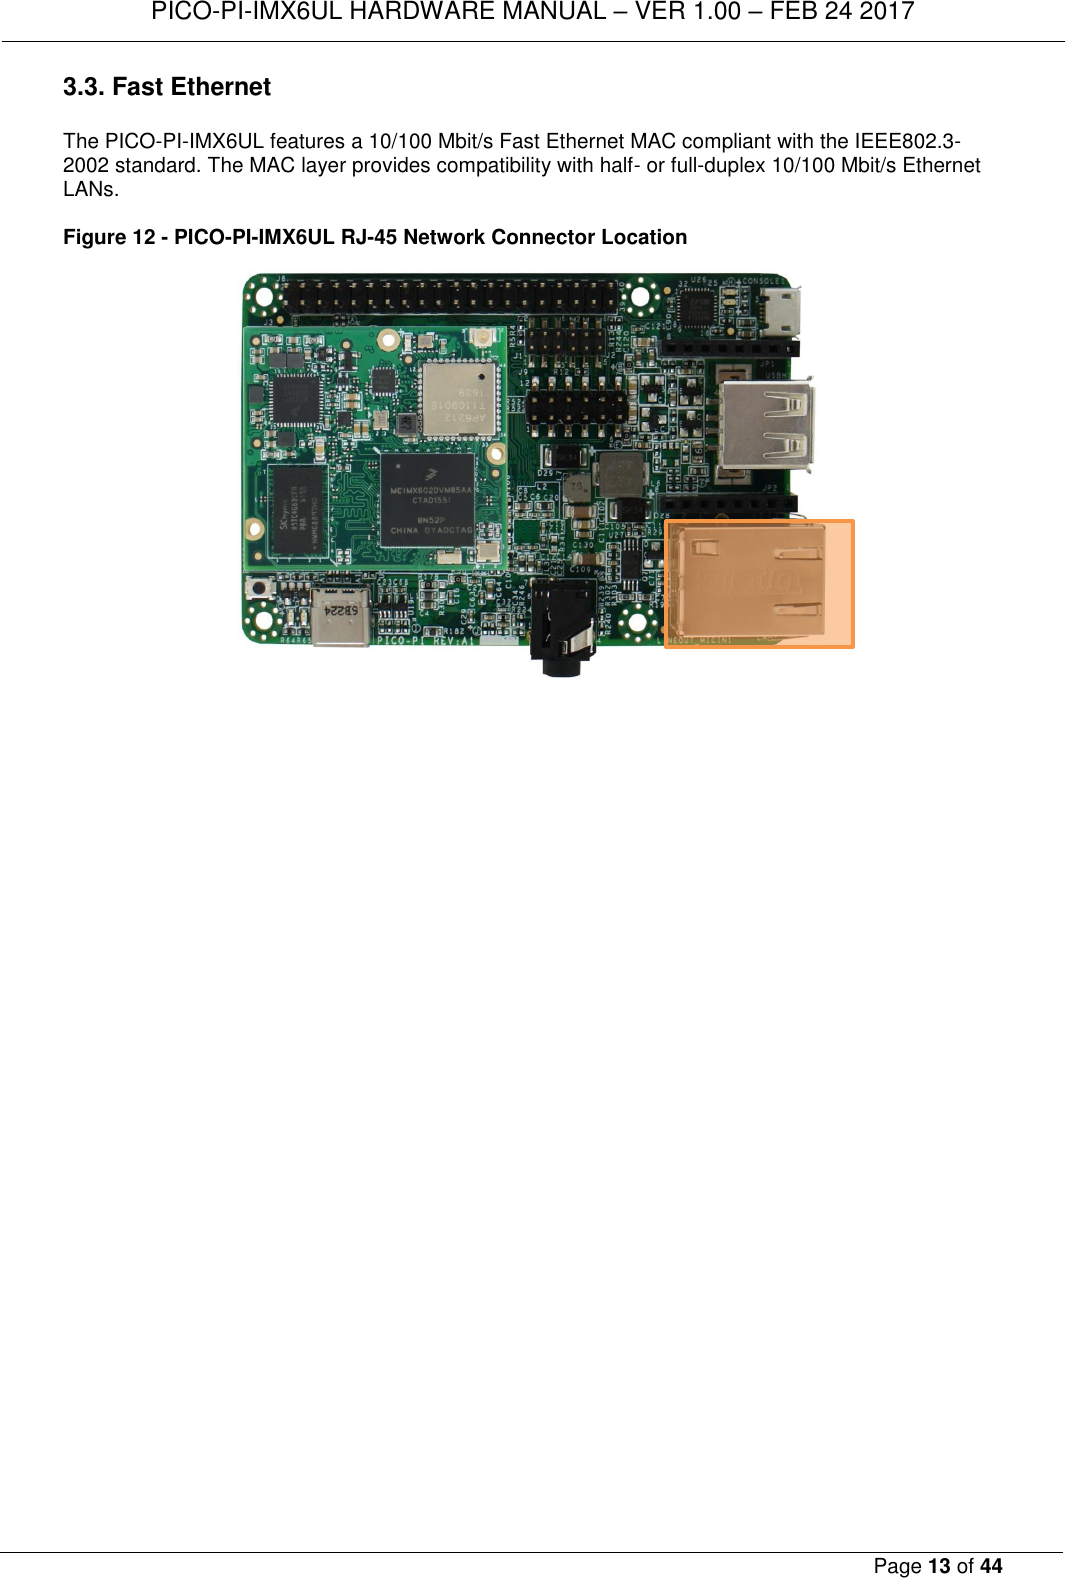 TECHNEXION PICOIMX6 WiFi+Bluetooth 4 0(HS) System on Module